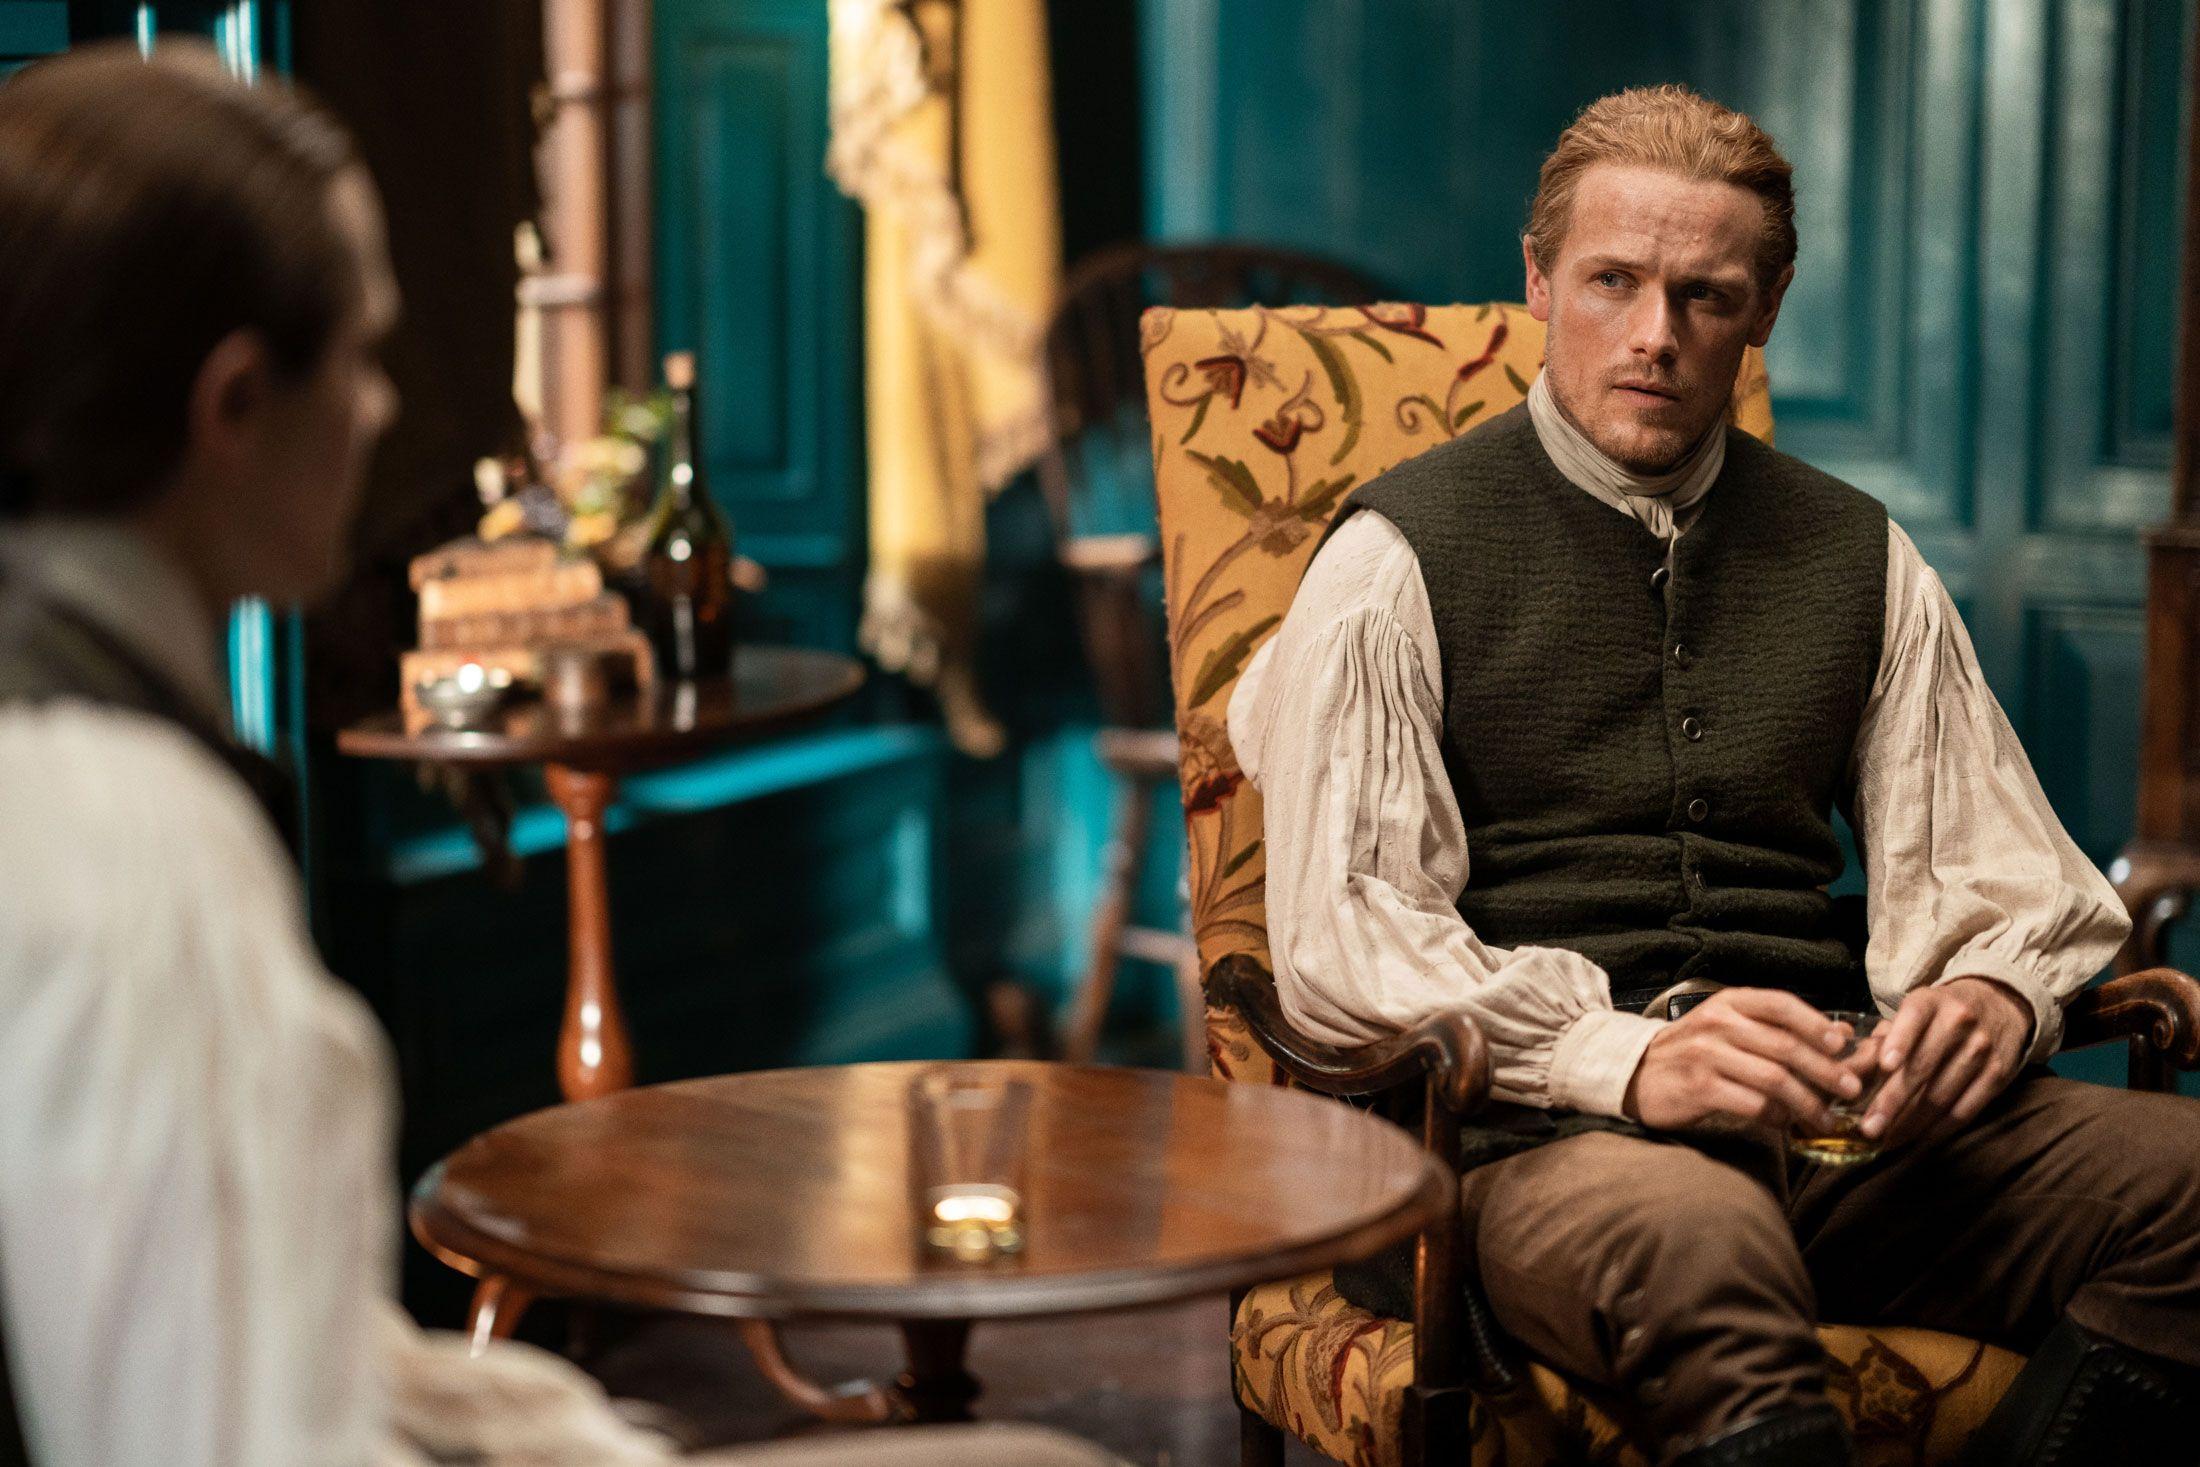 Outlander S Diana Gabaldon On Writing Episode 511 When Malva Will Be On The Show